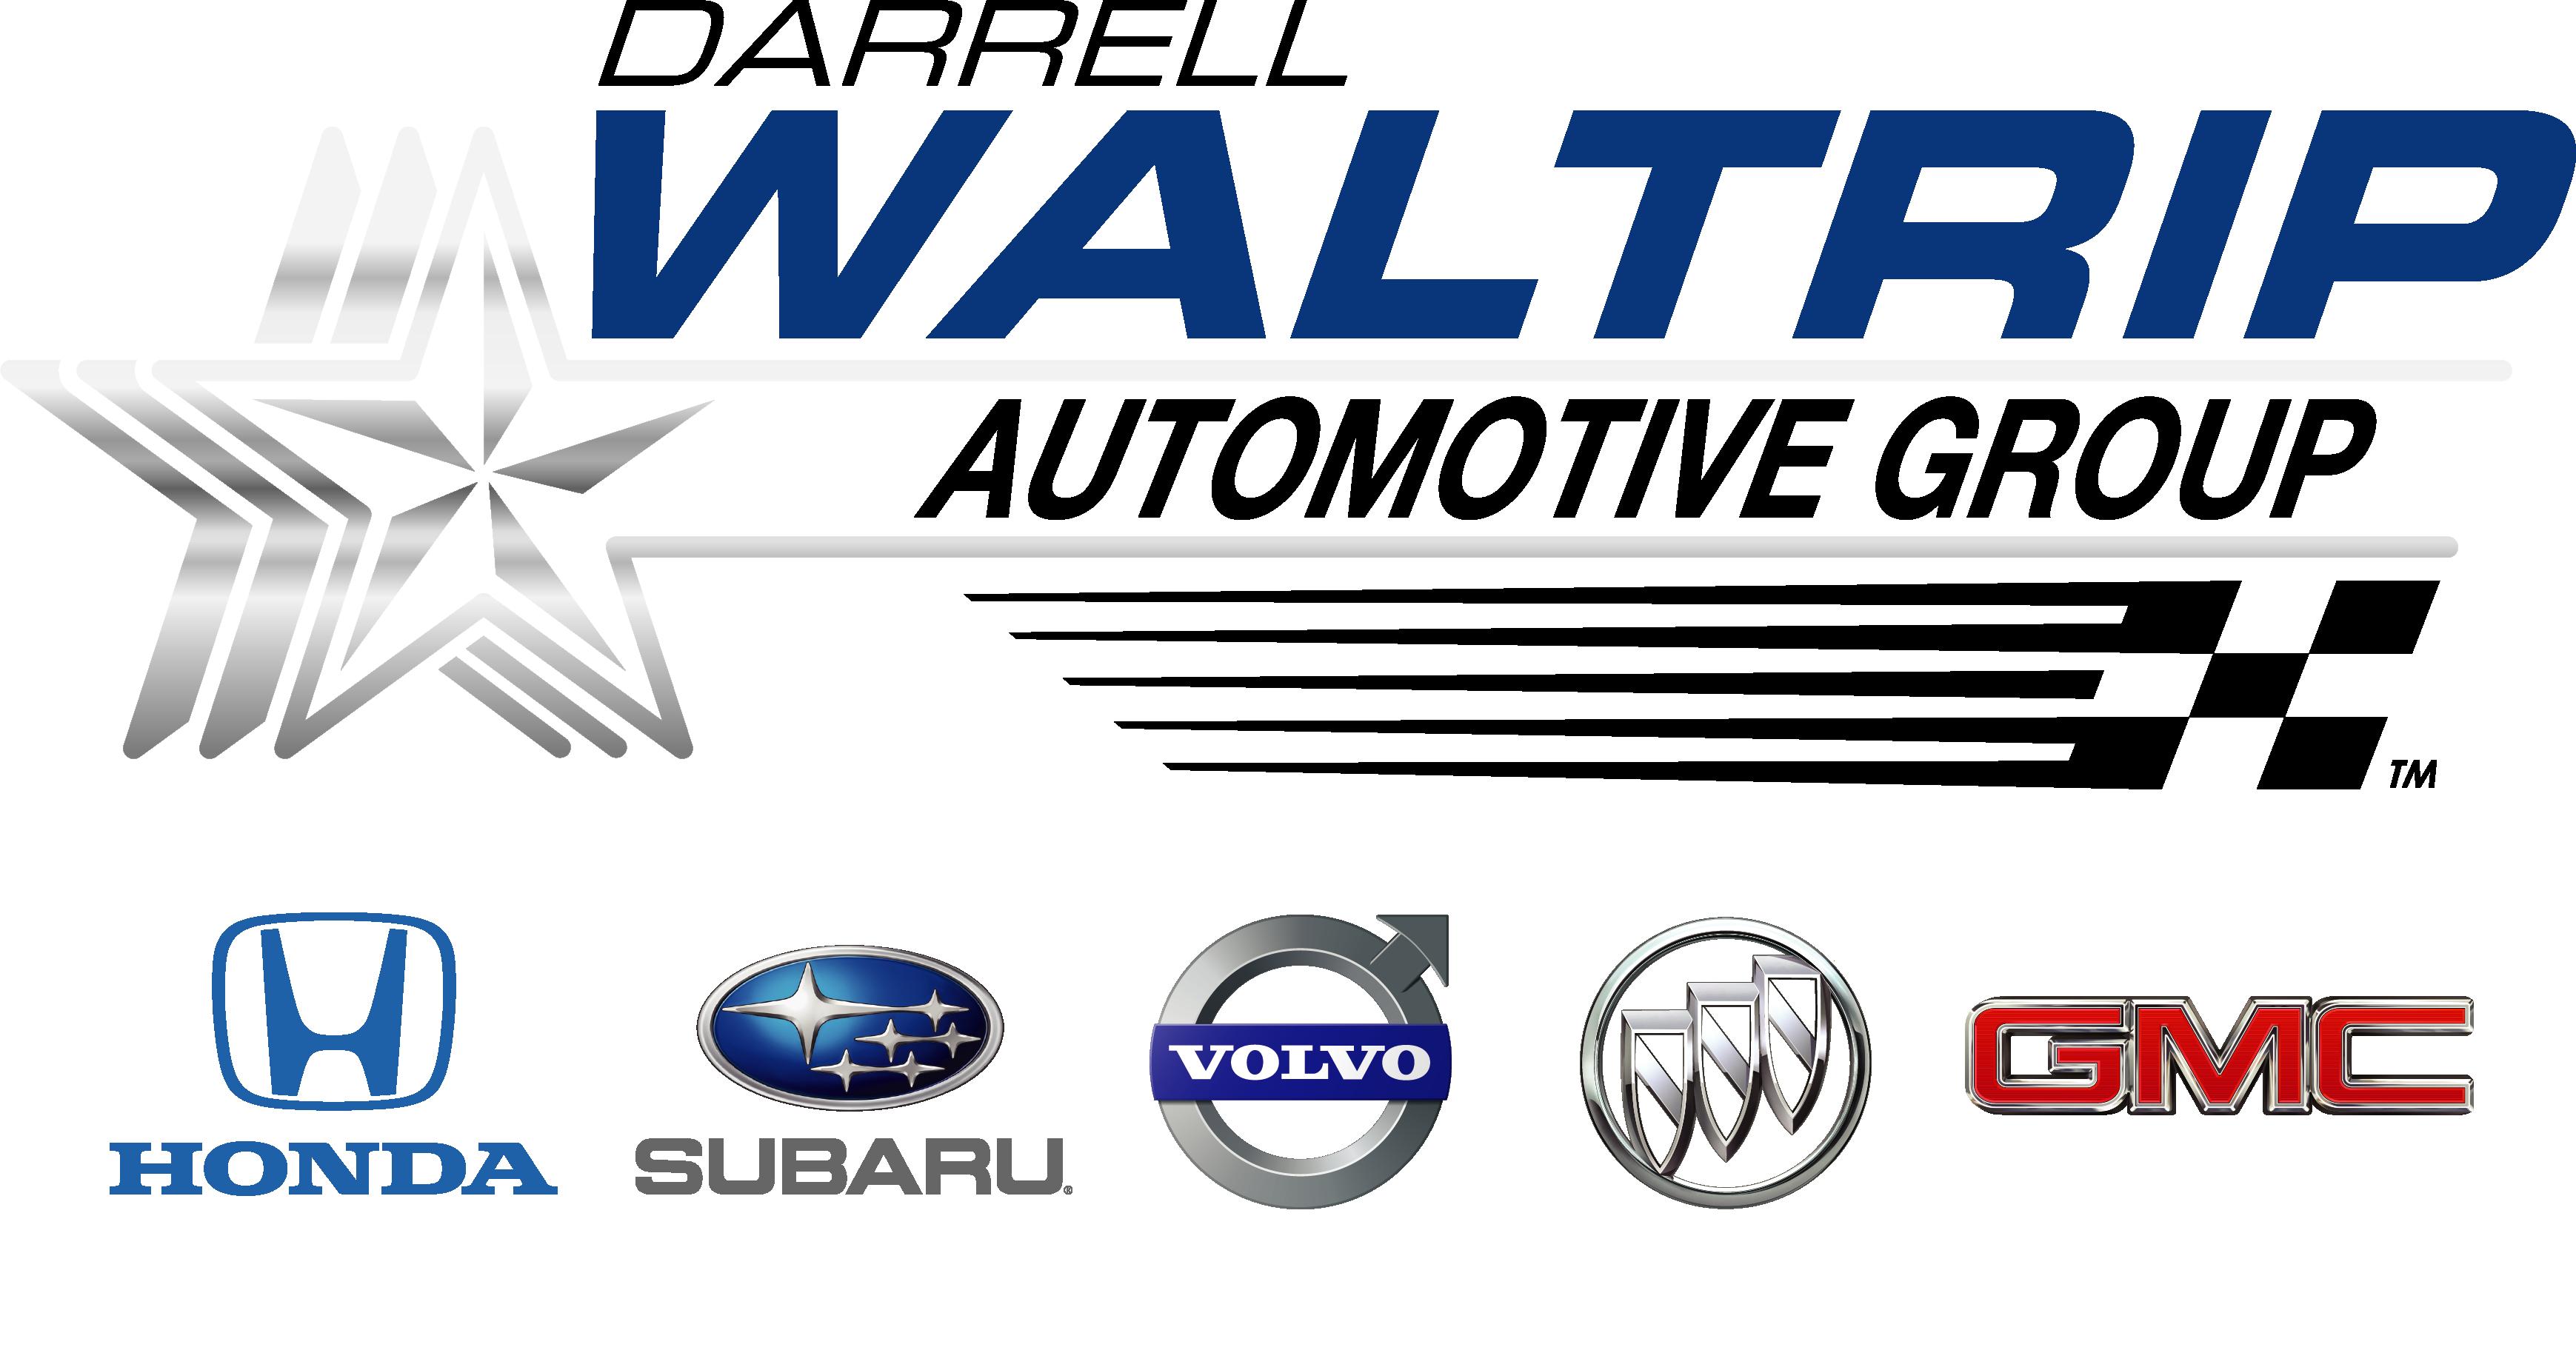 Darrell Waltrip Automotive Group